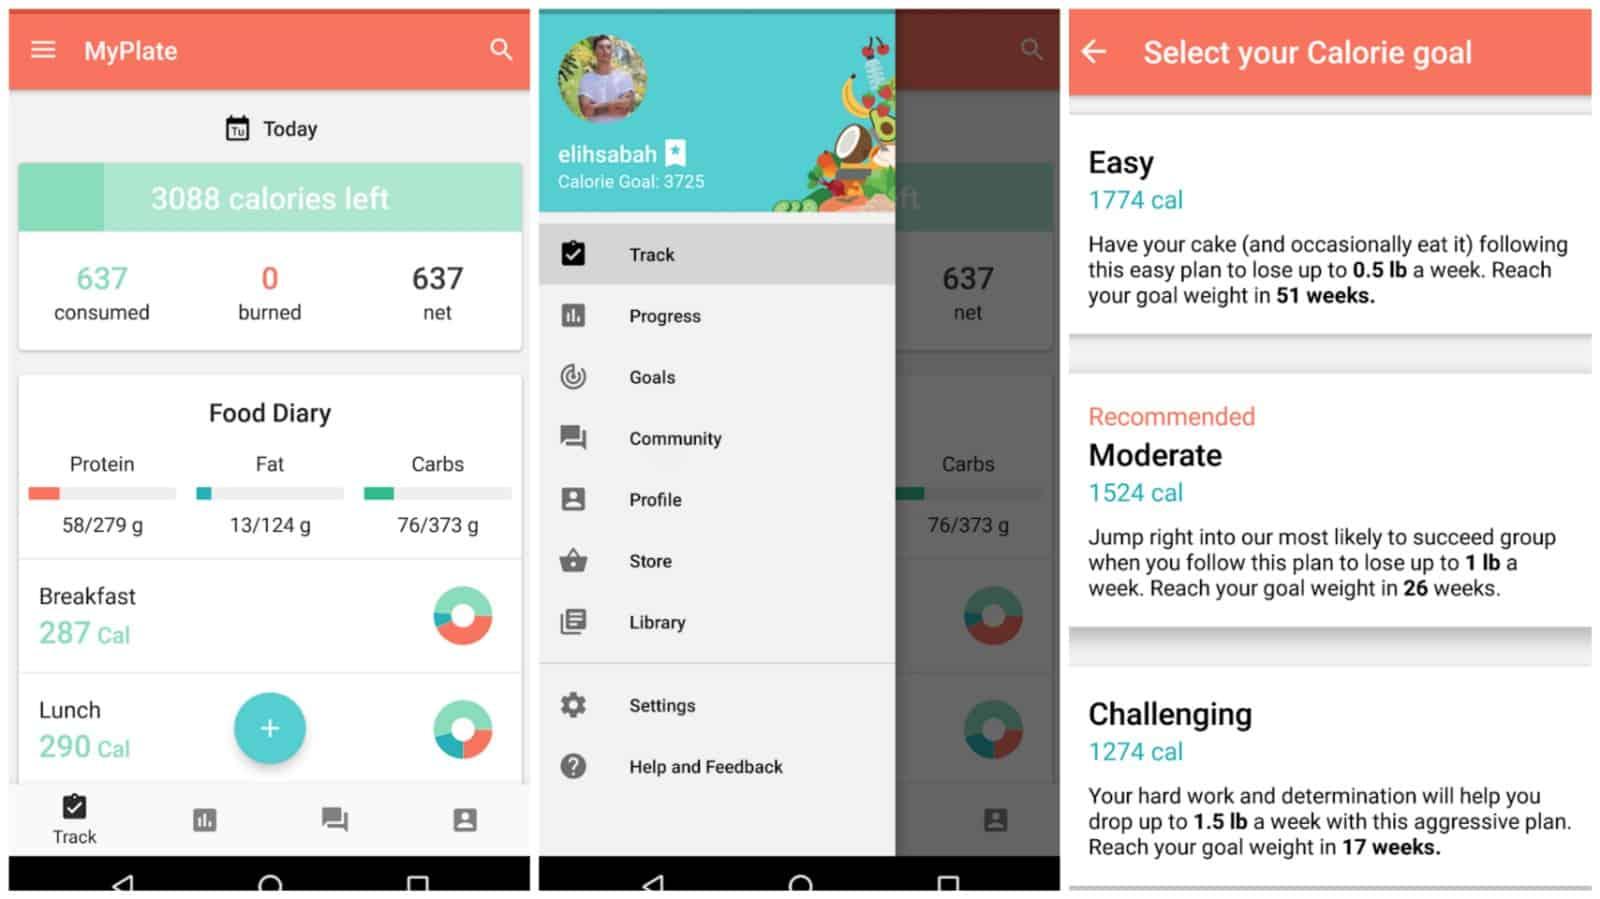 MyPlate Calorie Tracker app grid image